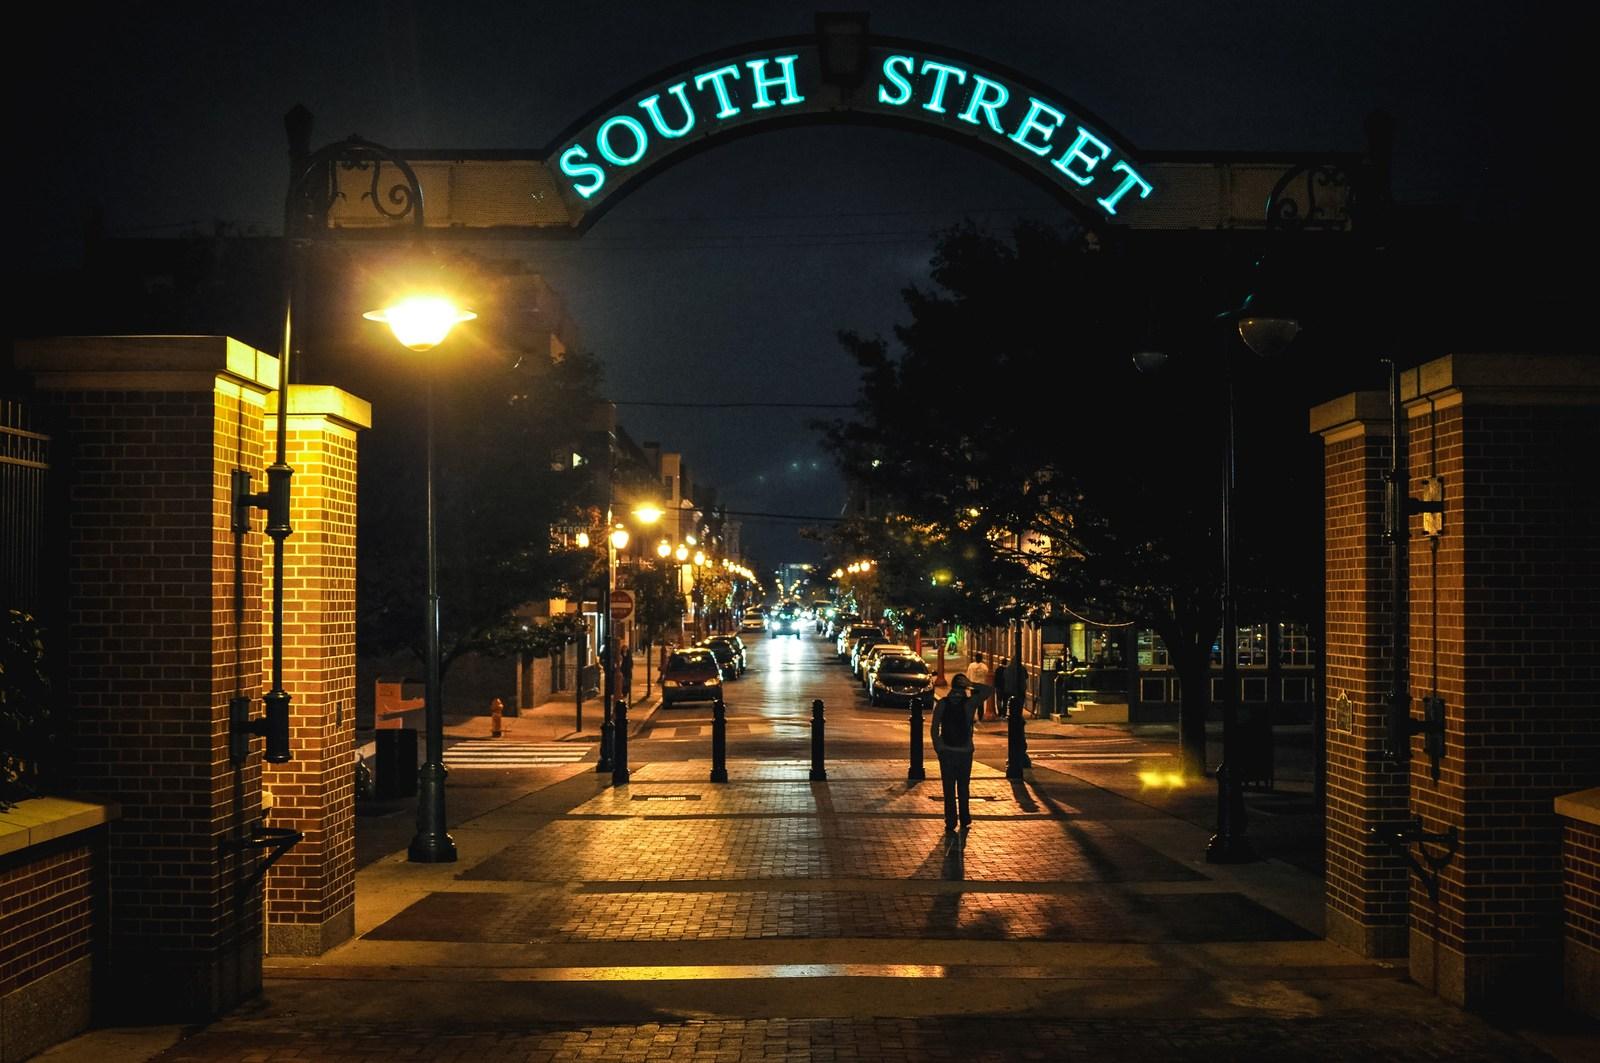 South Street à Philadelphie Philadelphie